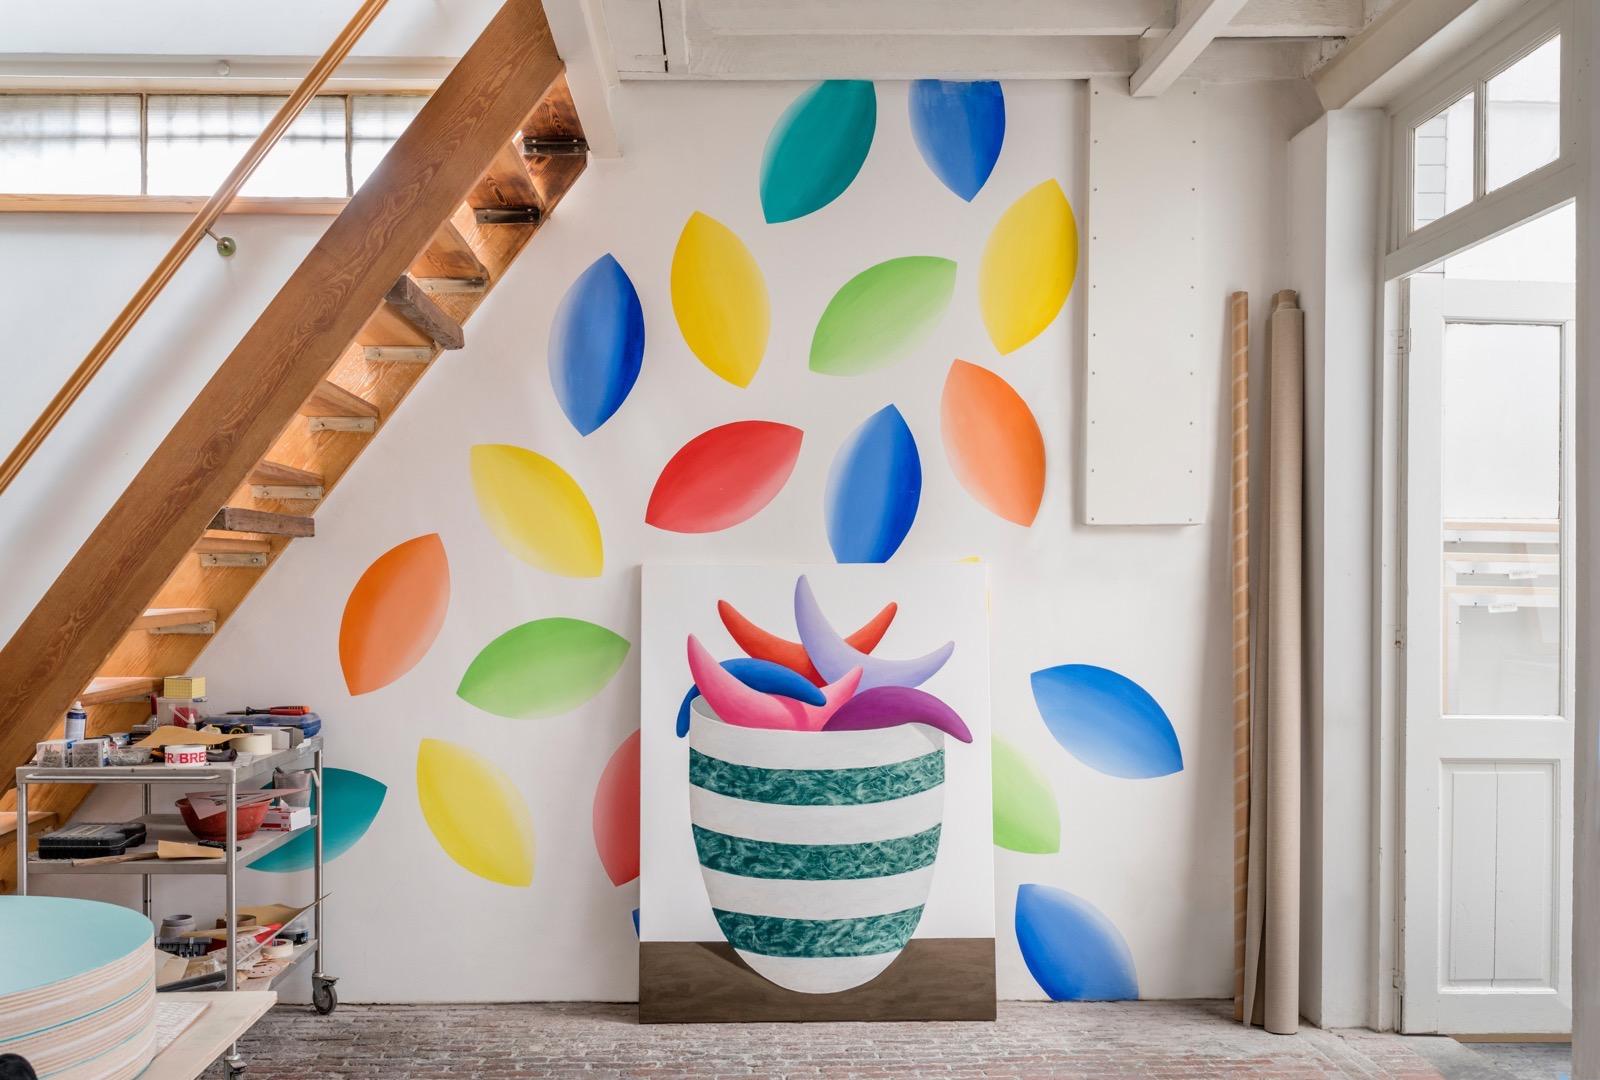 Nicolas Party mural studio